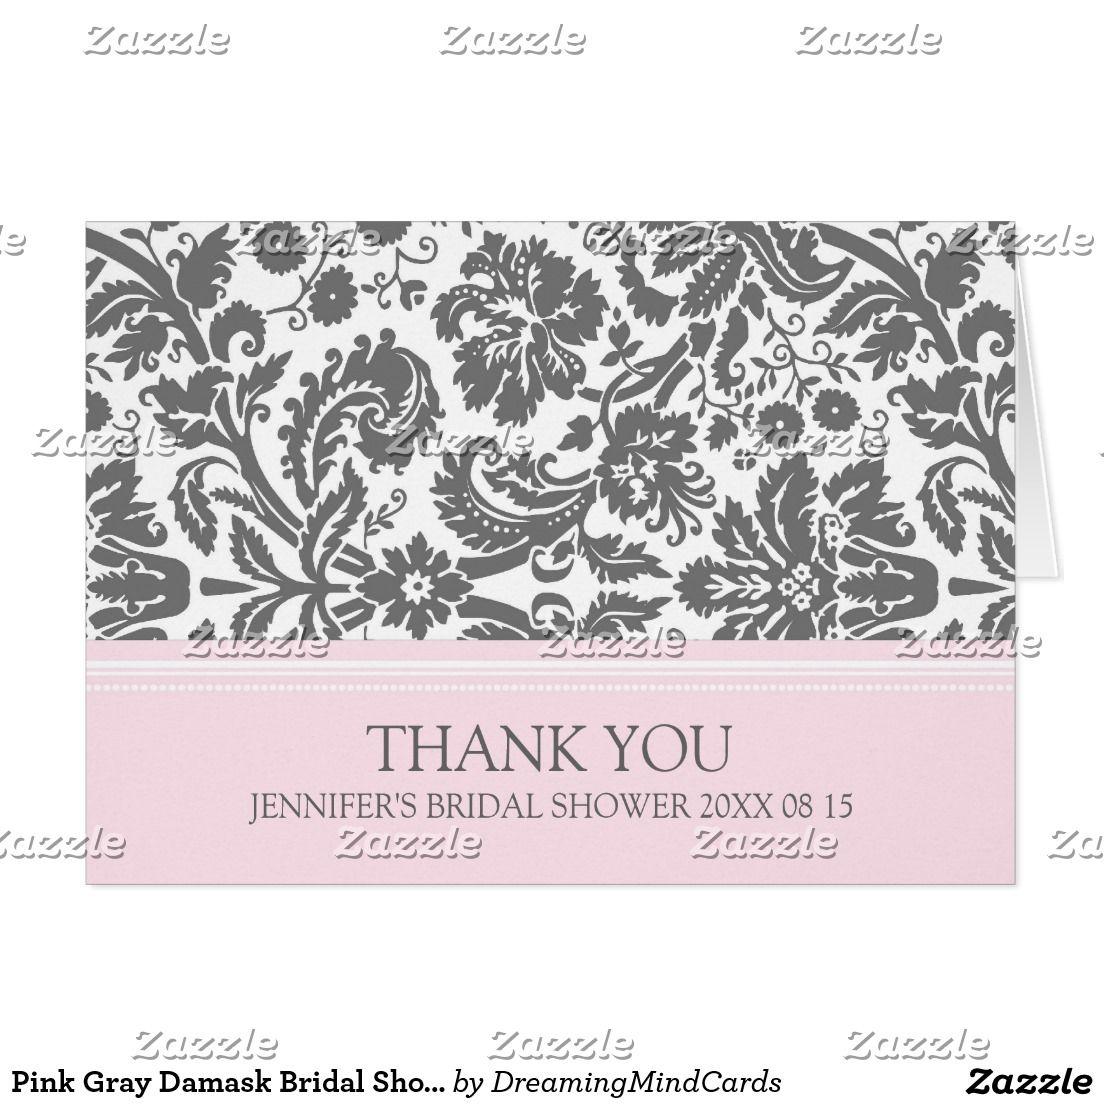 Pink Gray Damask Bridal Shower Thank You Card